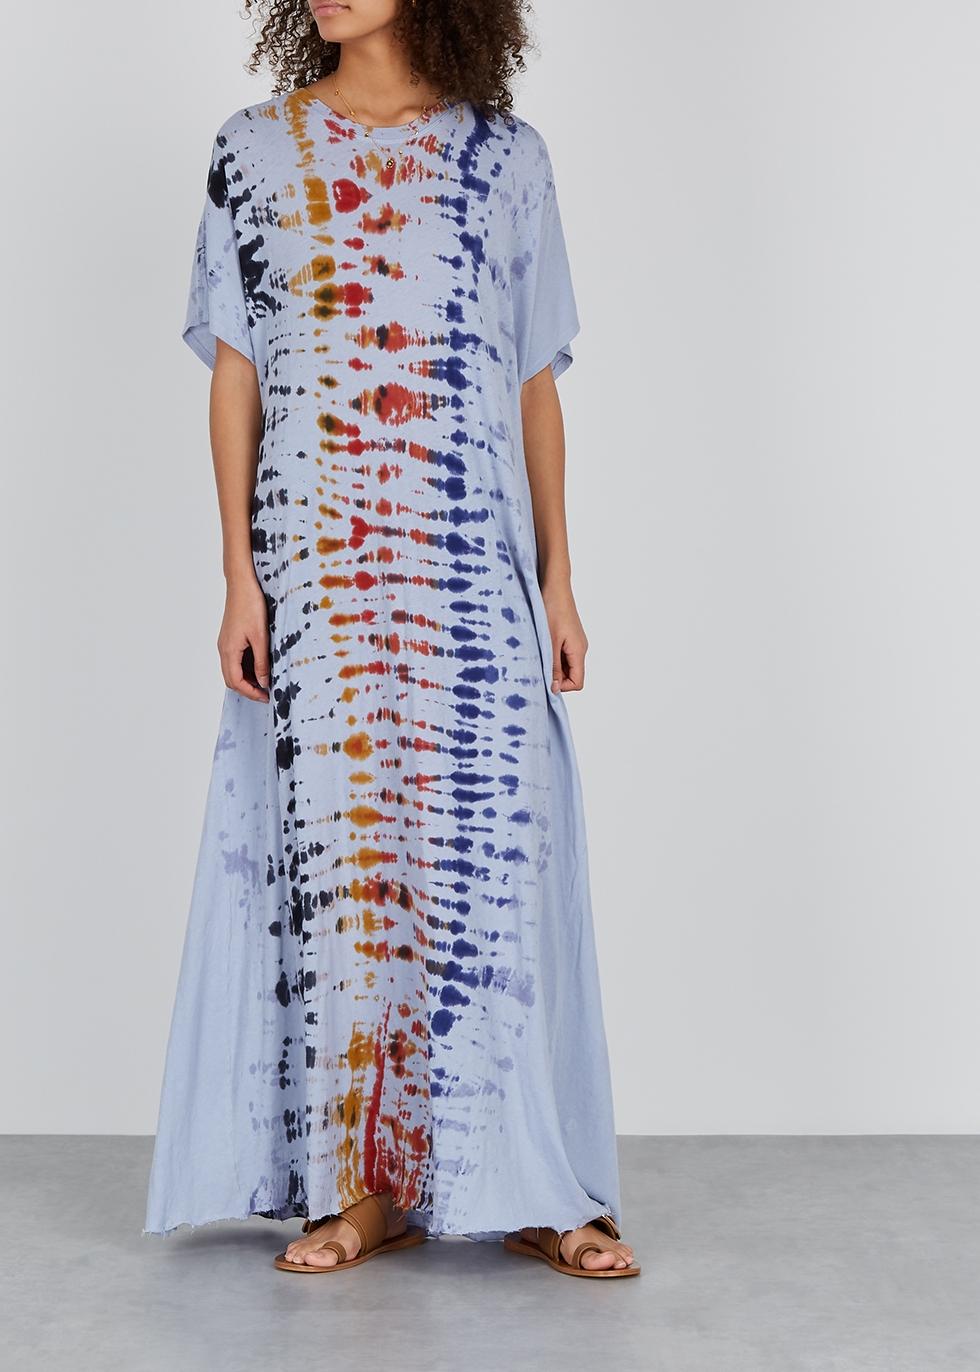 Tie-dye cotton maxi dress - RAQUEL ALLEGRA